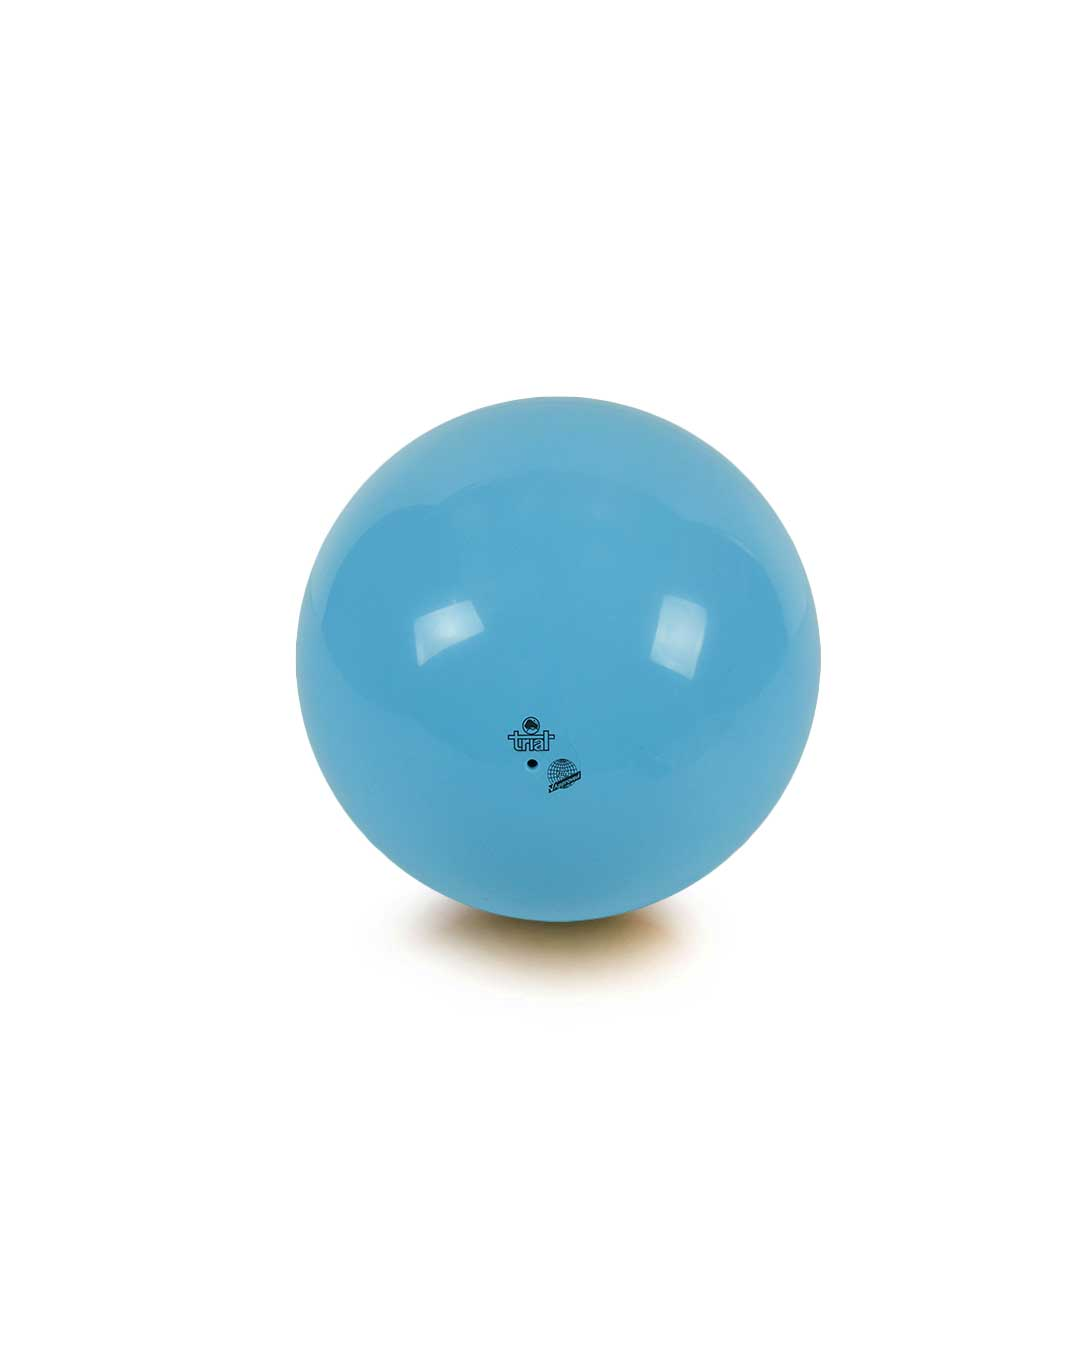 Balón de gimnasia rítmica – Marca Trial color celeste 19 cm (certificado FIG)